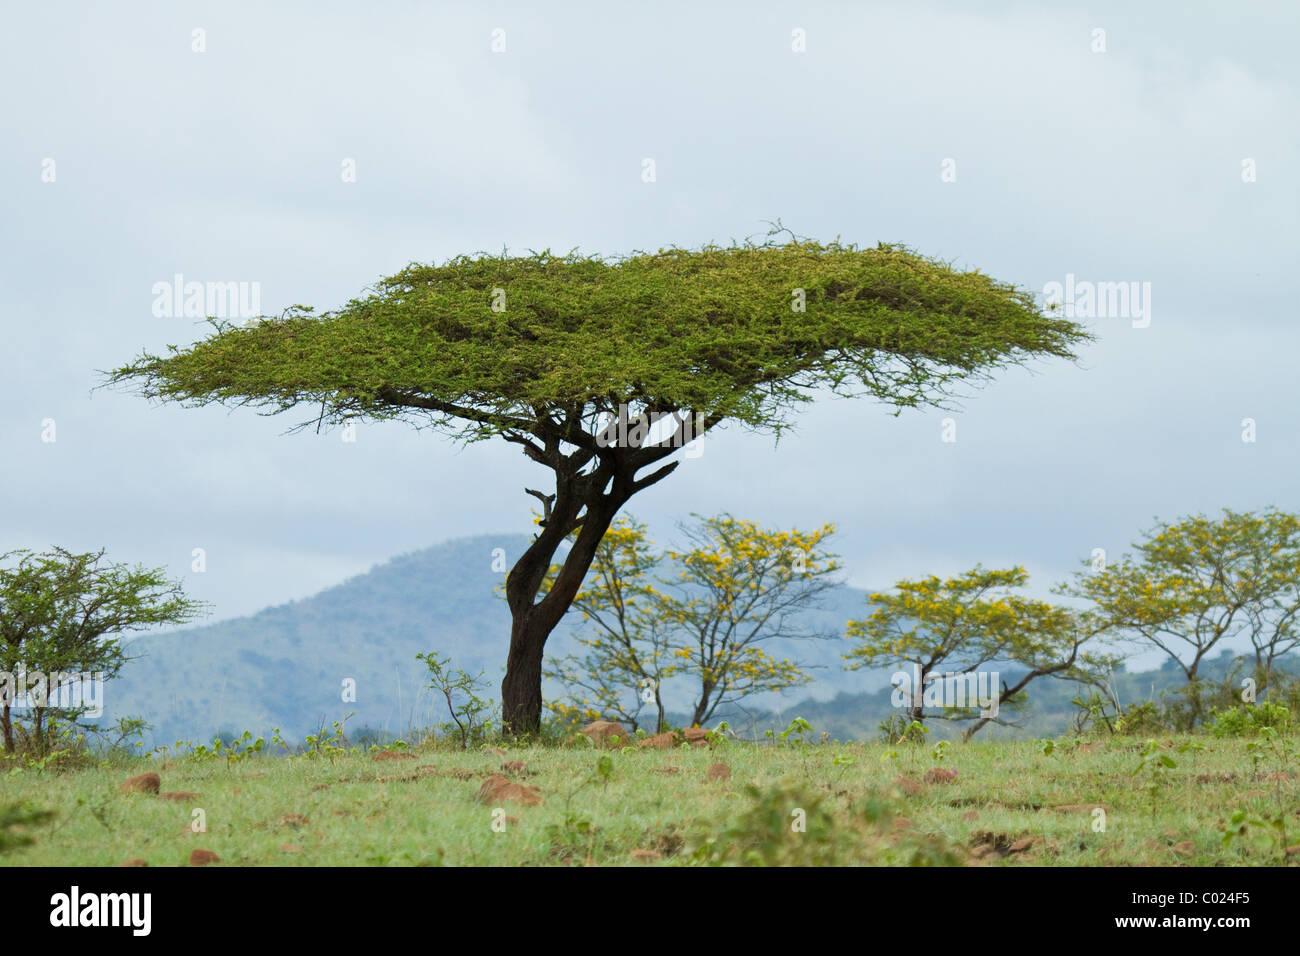 Paesaggio acacia in Hluhluwe-iMfolozi Park Immagini Stock